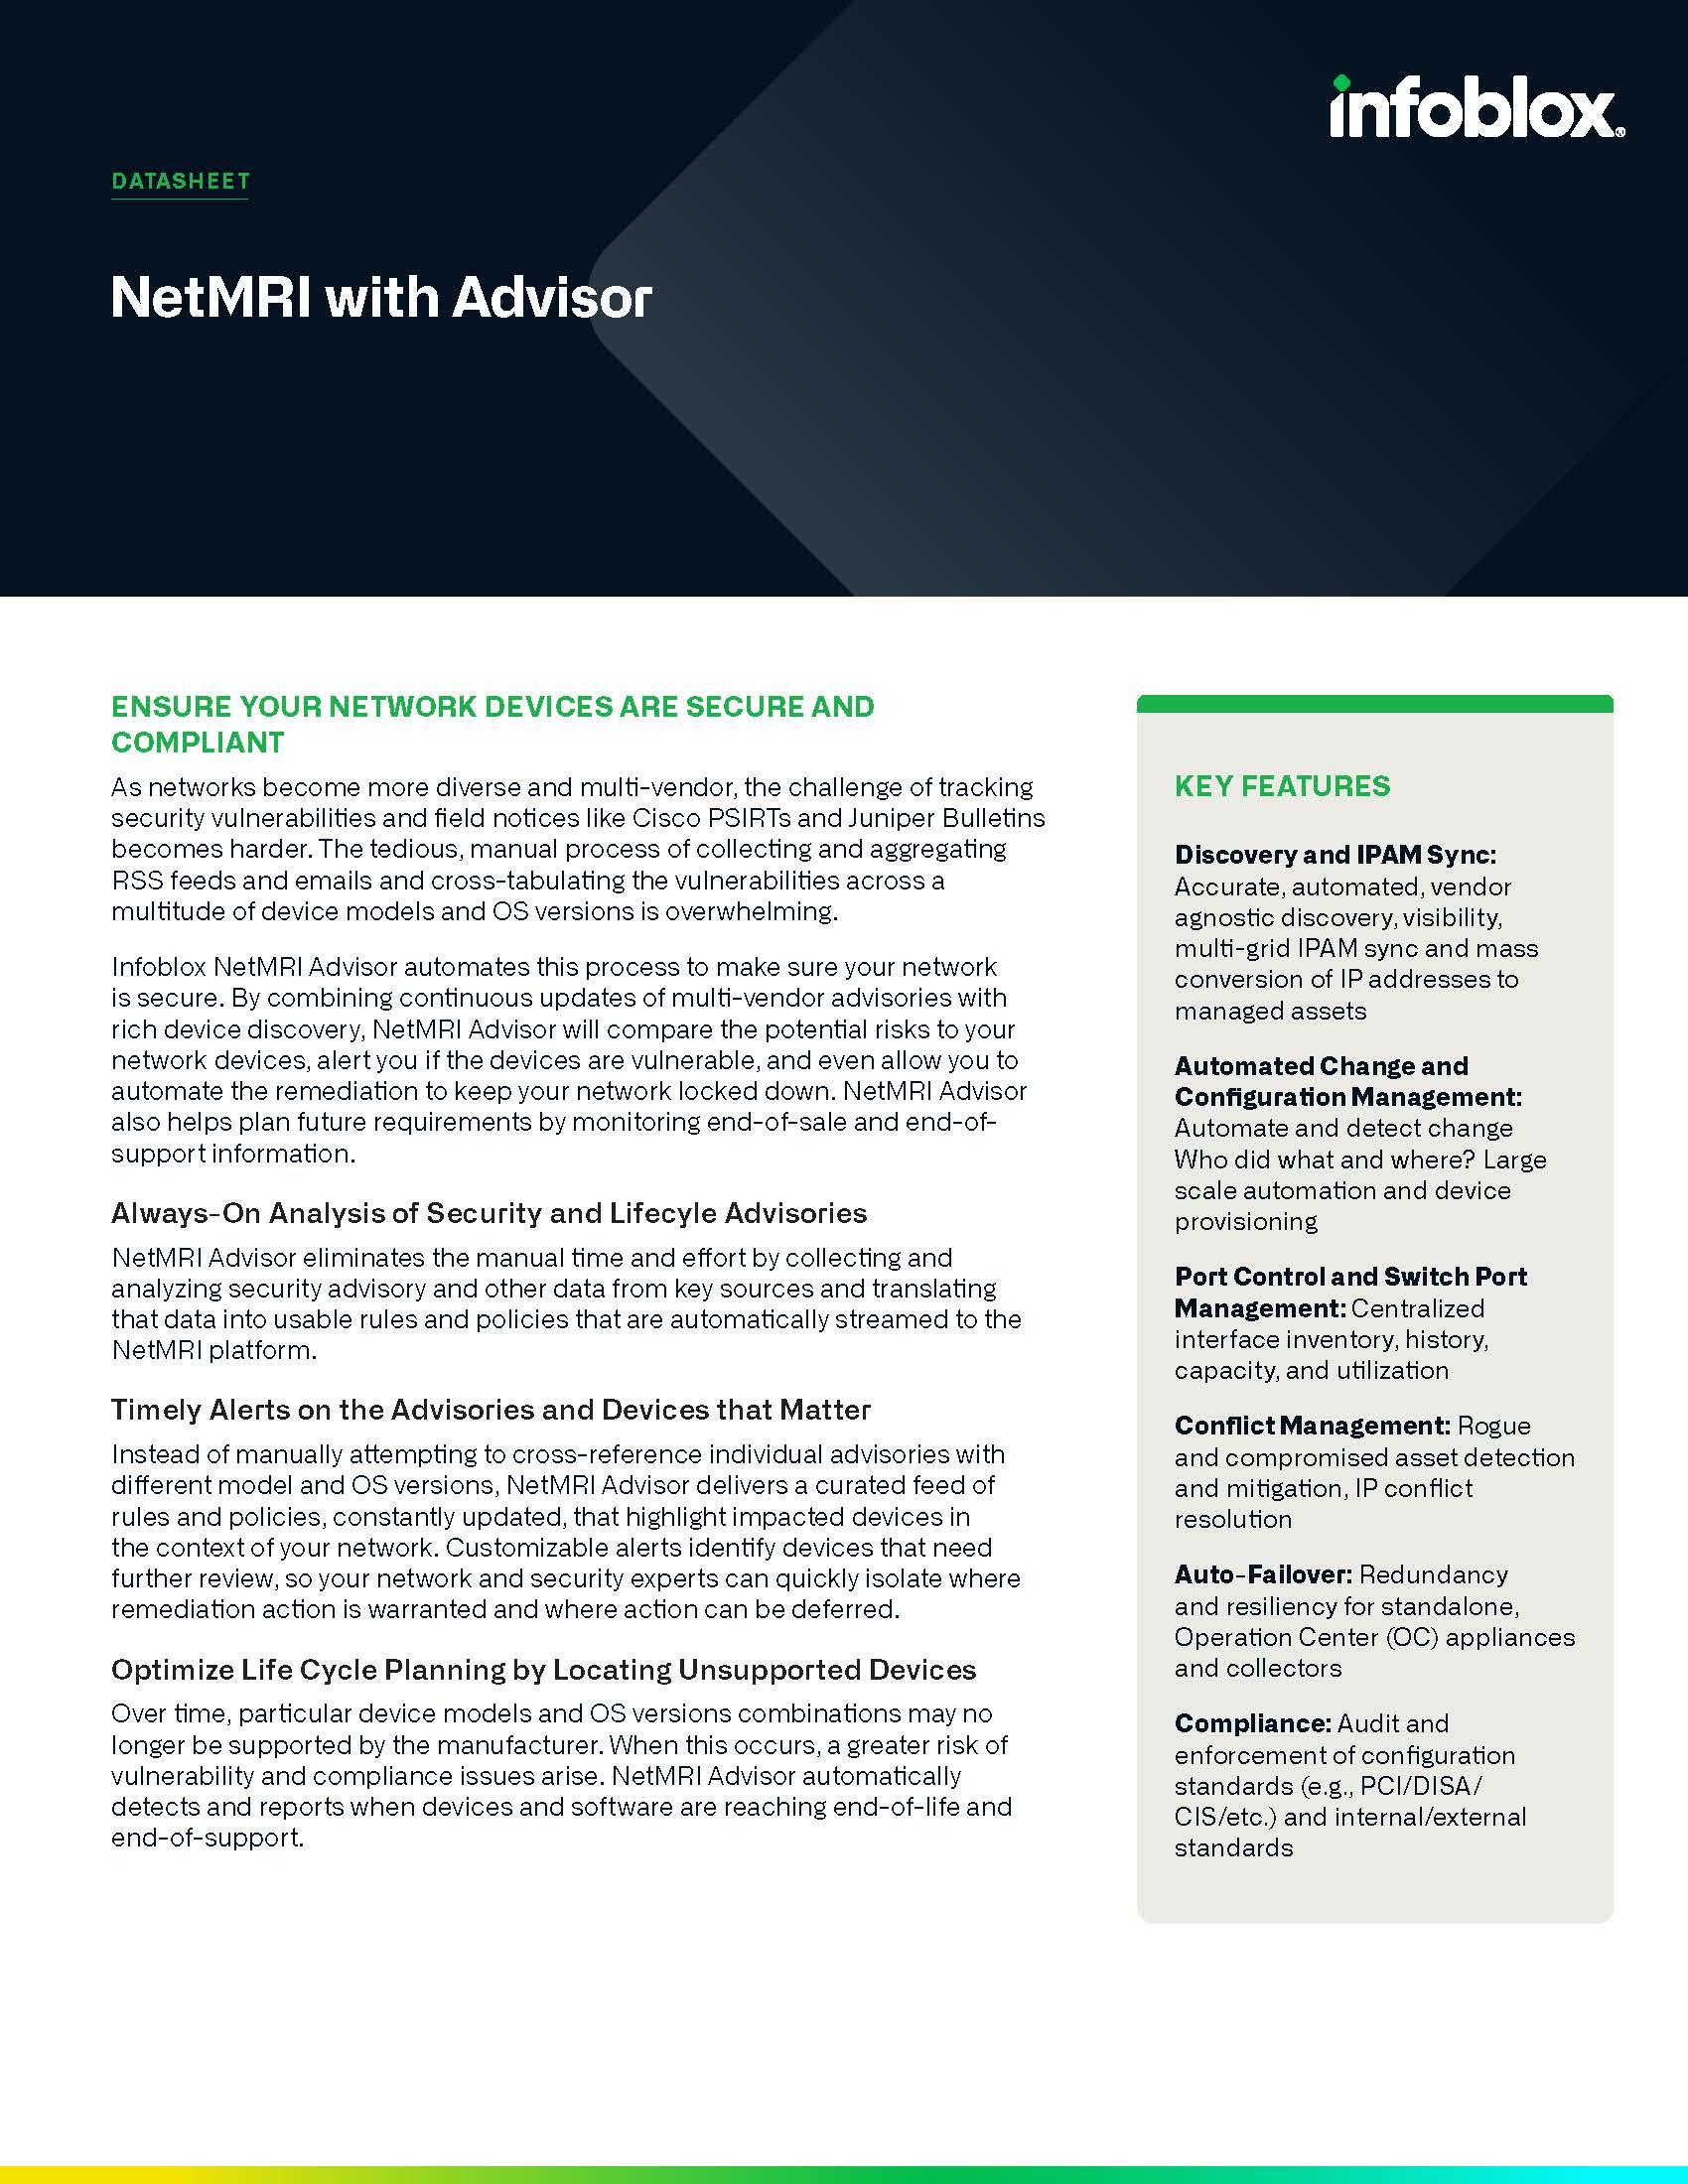 Infoblox NetMRI Advisor